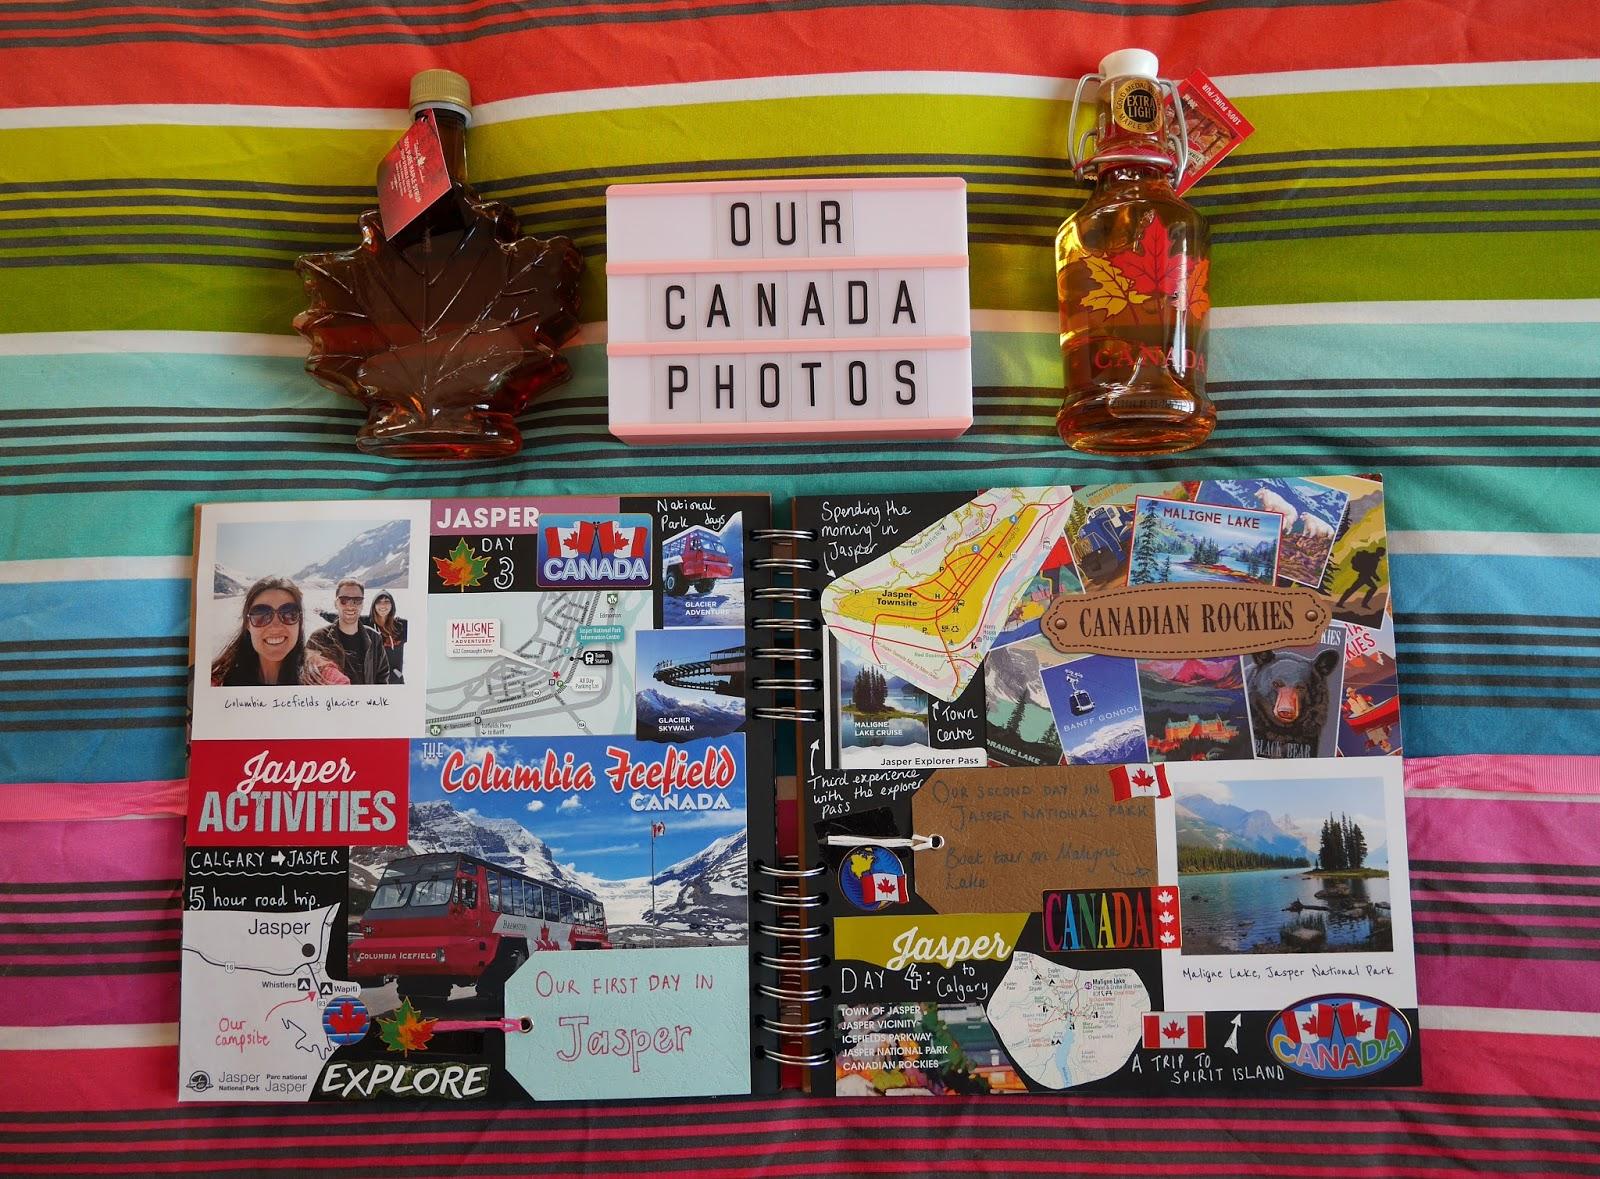 Canada travel scrapbook pages 3-4 (Jasper National Park) featuring Printiki's retro prints